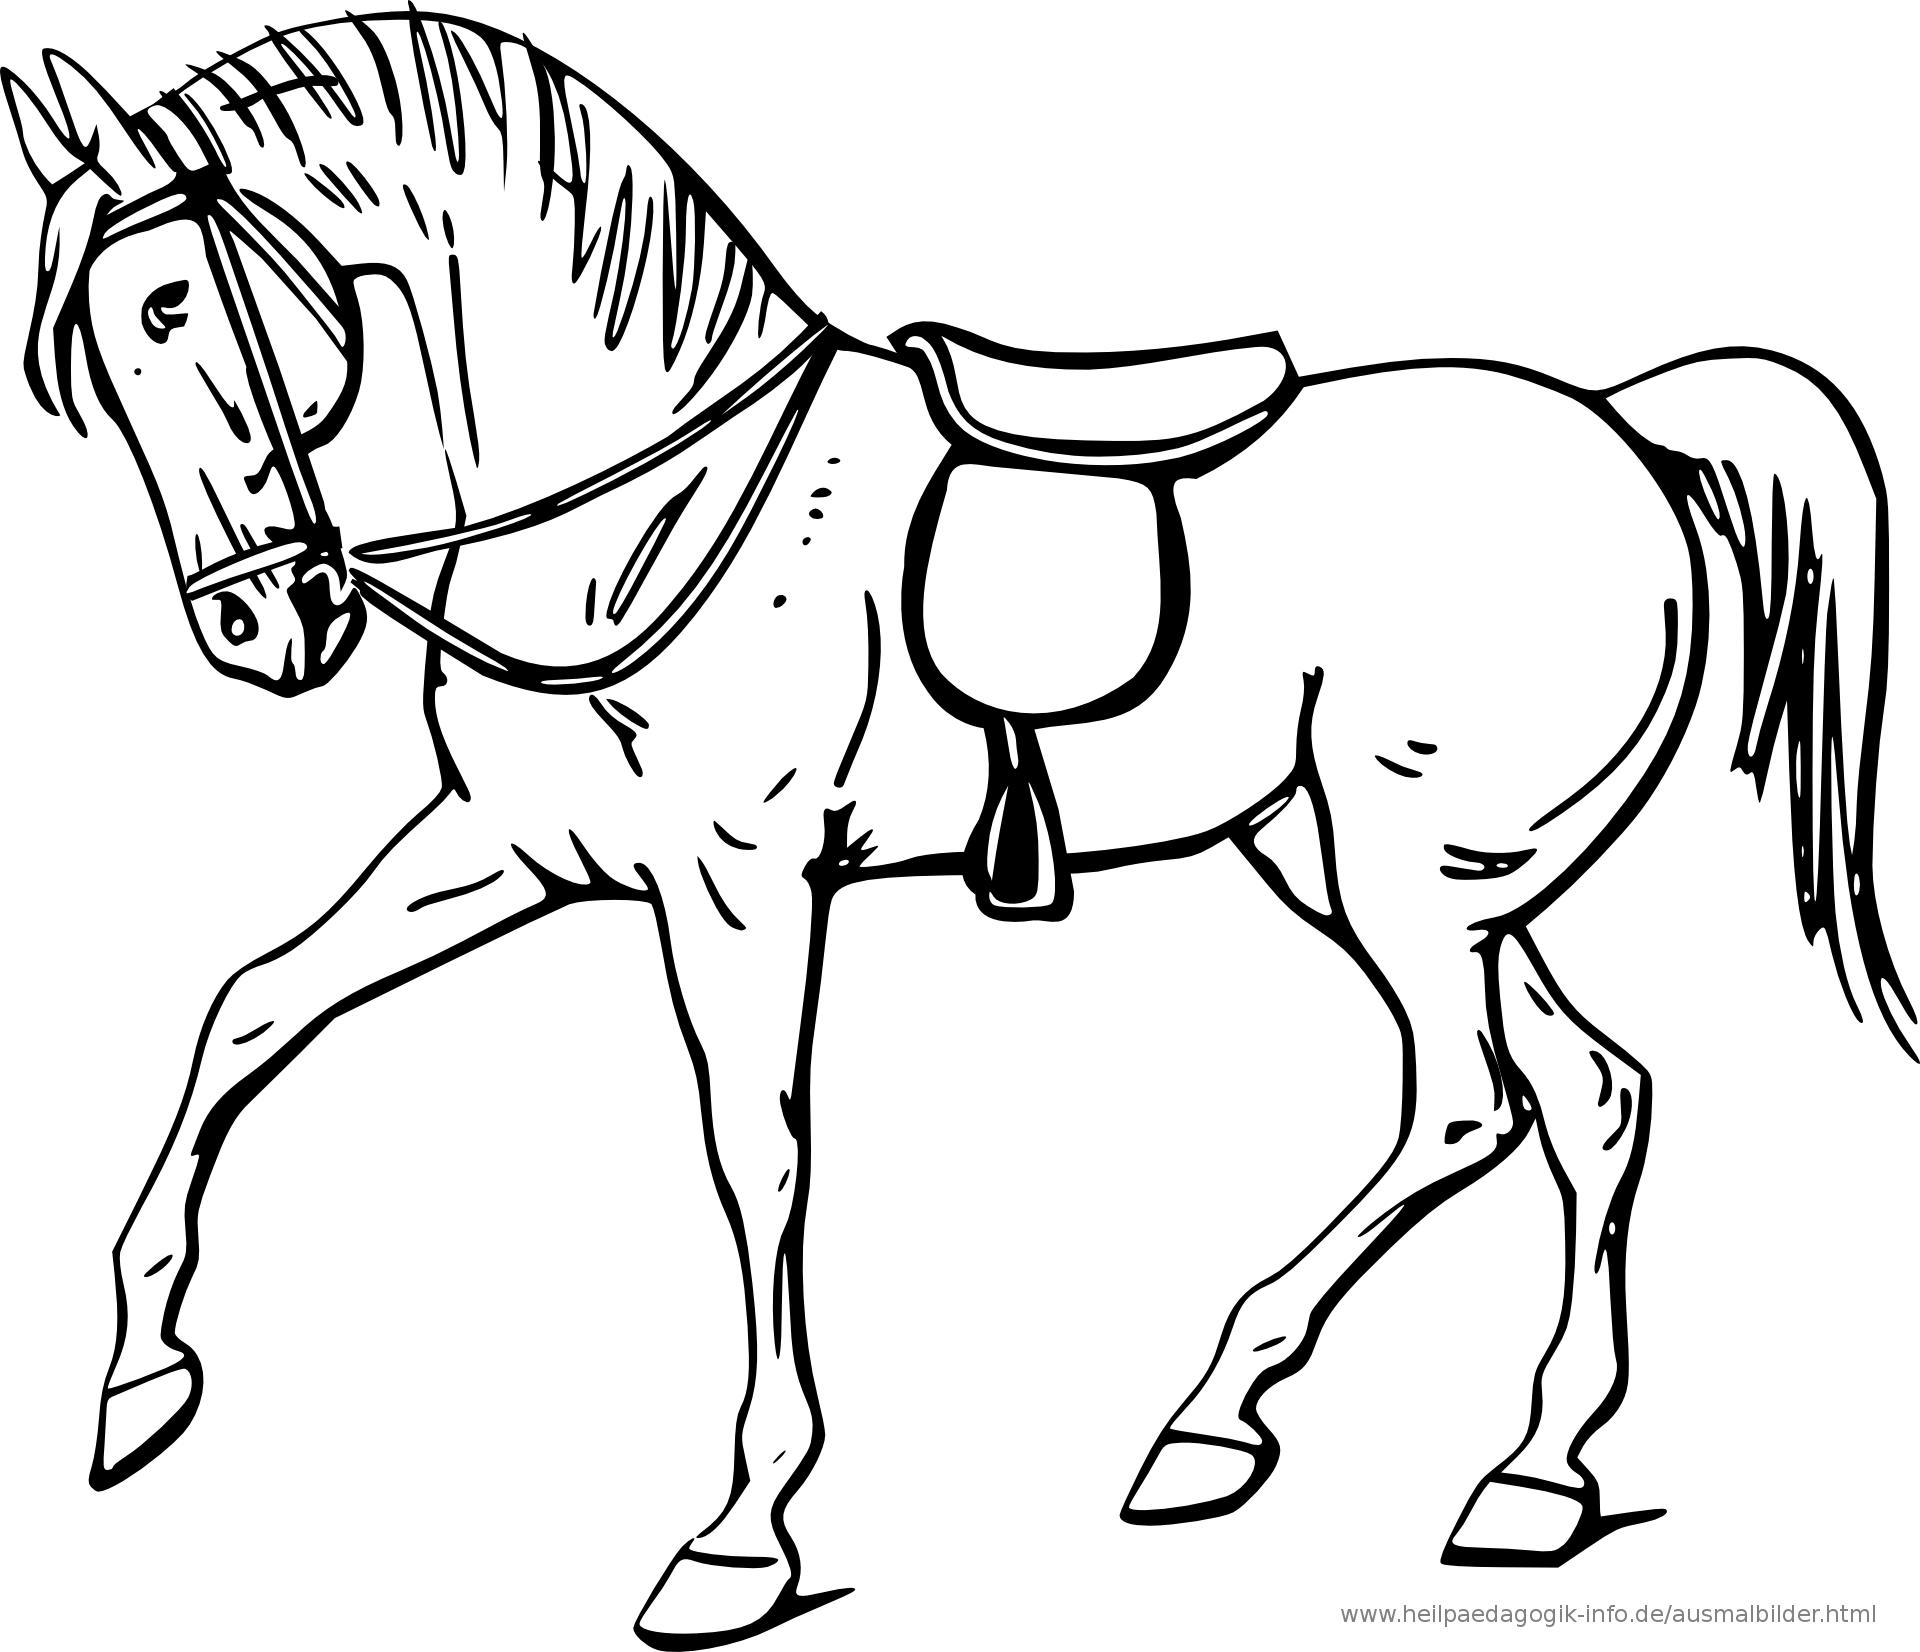 Ausmalbilder Pferde Ausmalbilder Pferde Ausmalbilder Pferde Malvorlagen Pferde Kindergarten Malvorlagen